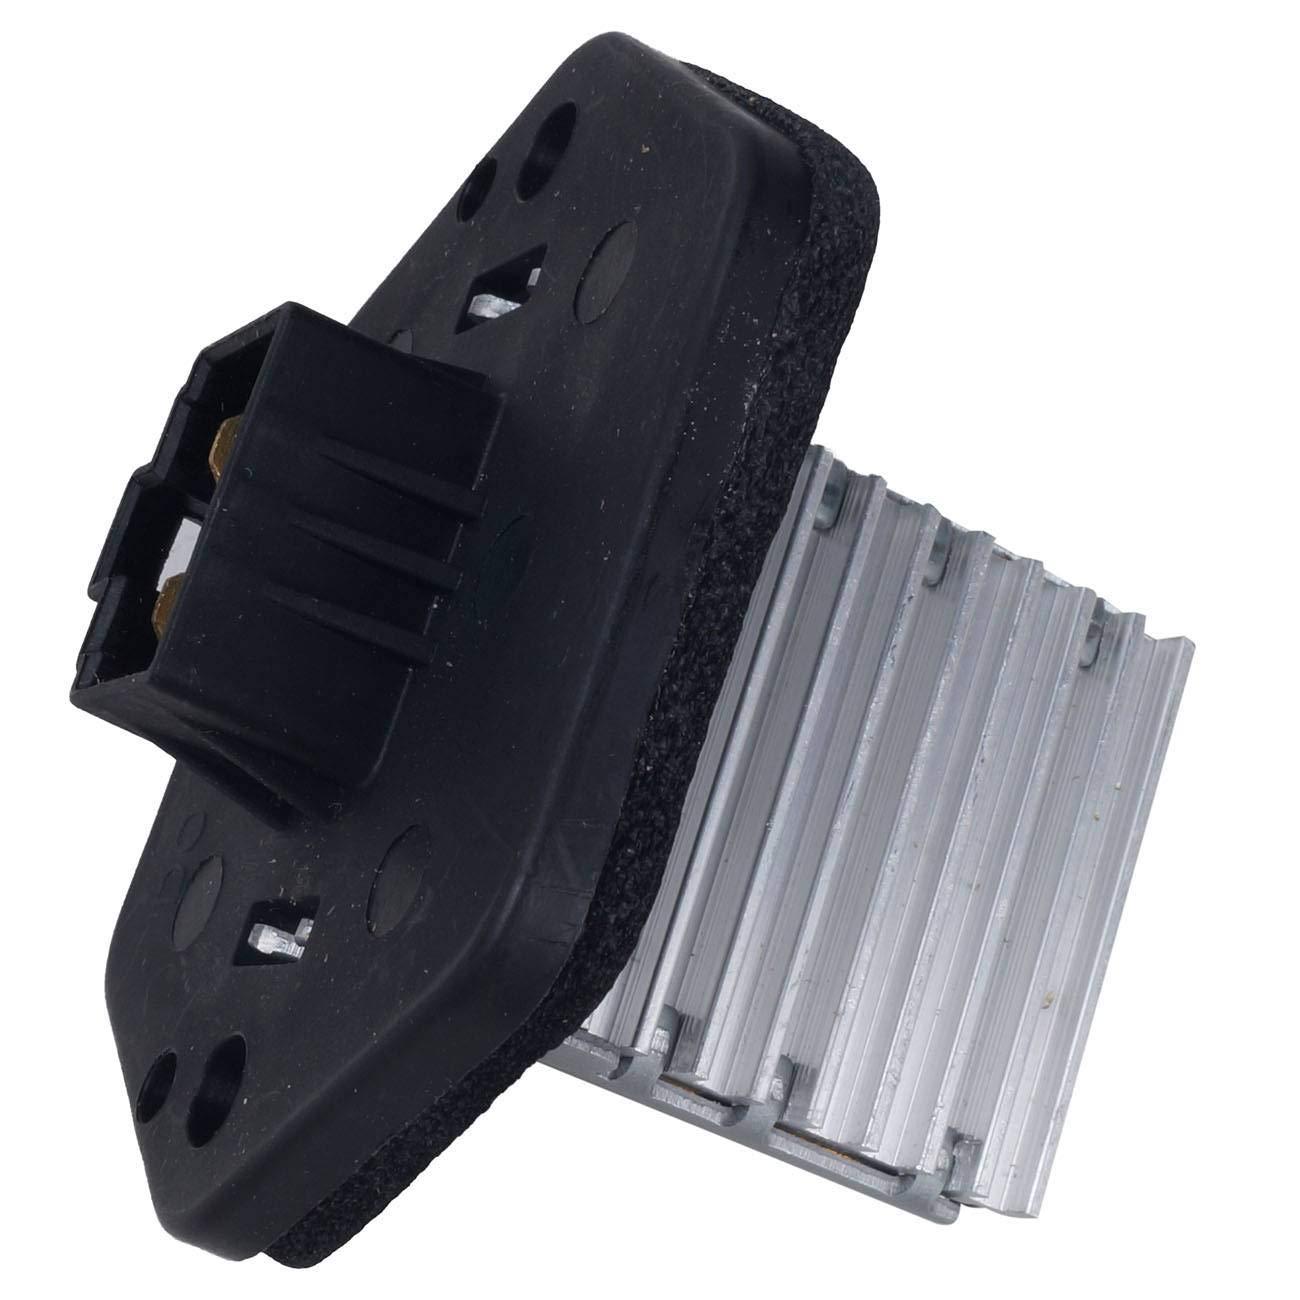 TOPAZ 0K30C-61B15 HVAC Heater Blower Motor Resistor for Kia Rio Spectra5 04-06